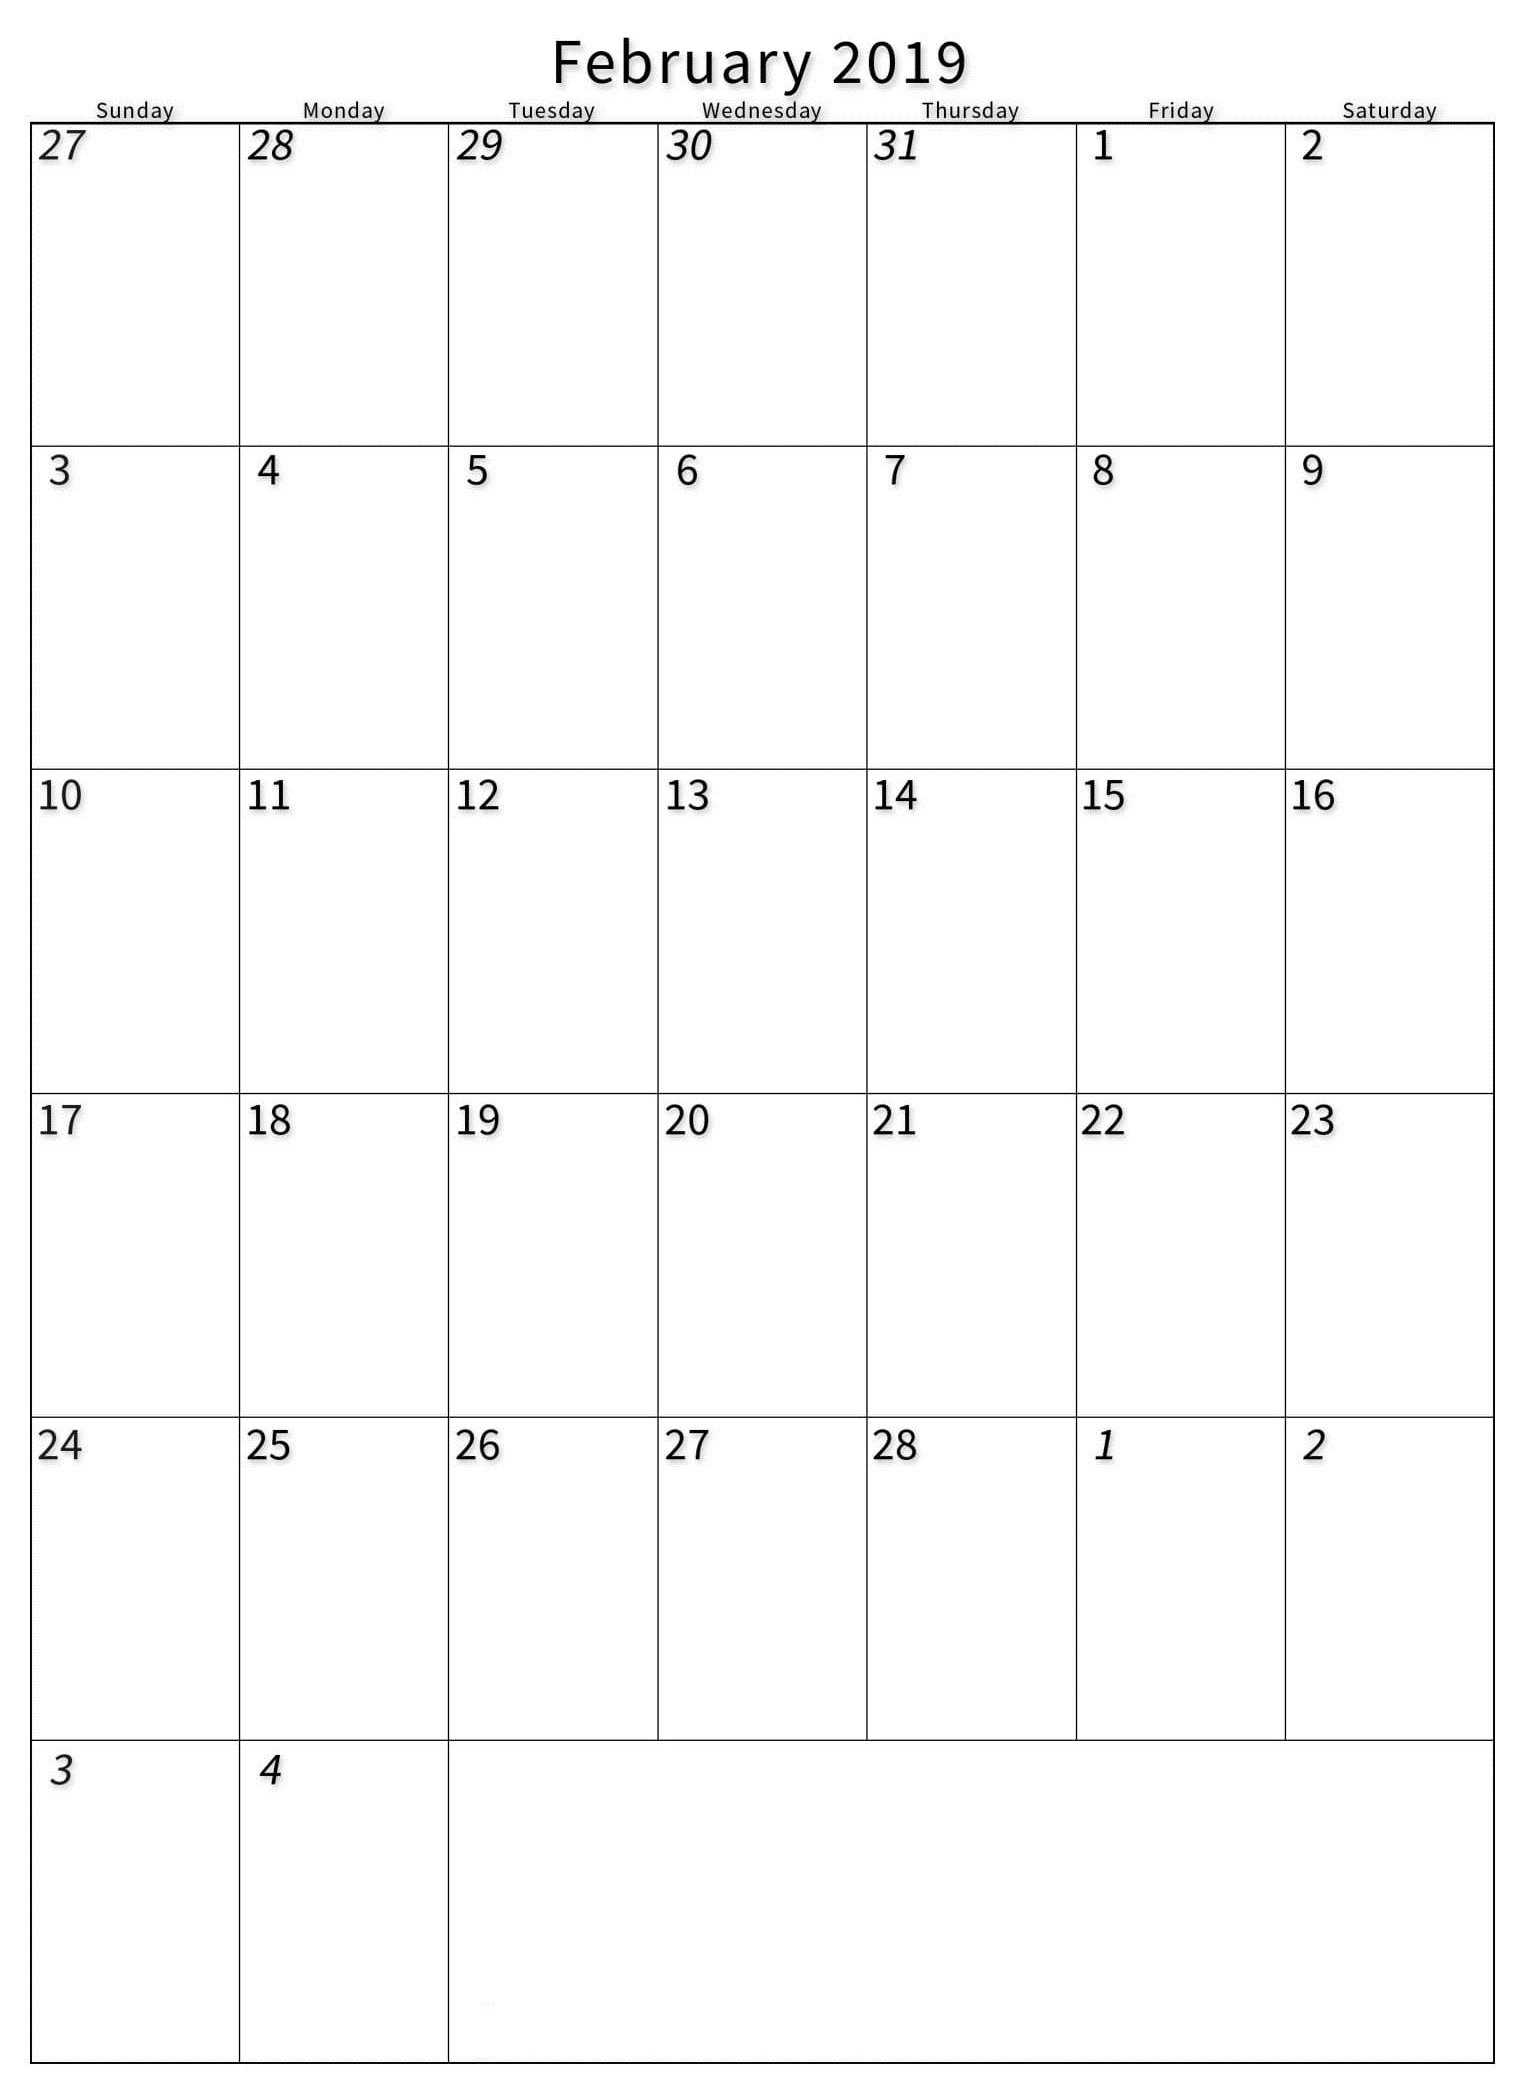 February 2019 Portrait Calendar Template – Printable Calendar Templates Calendar 2019 Portrait